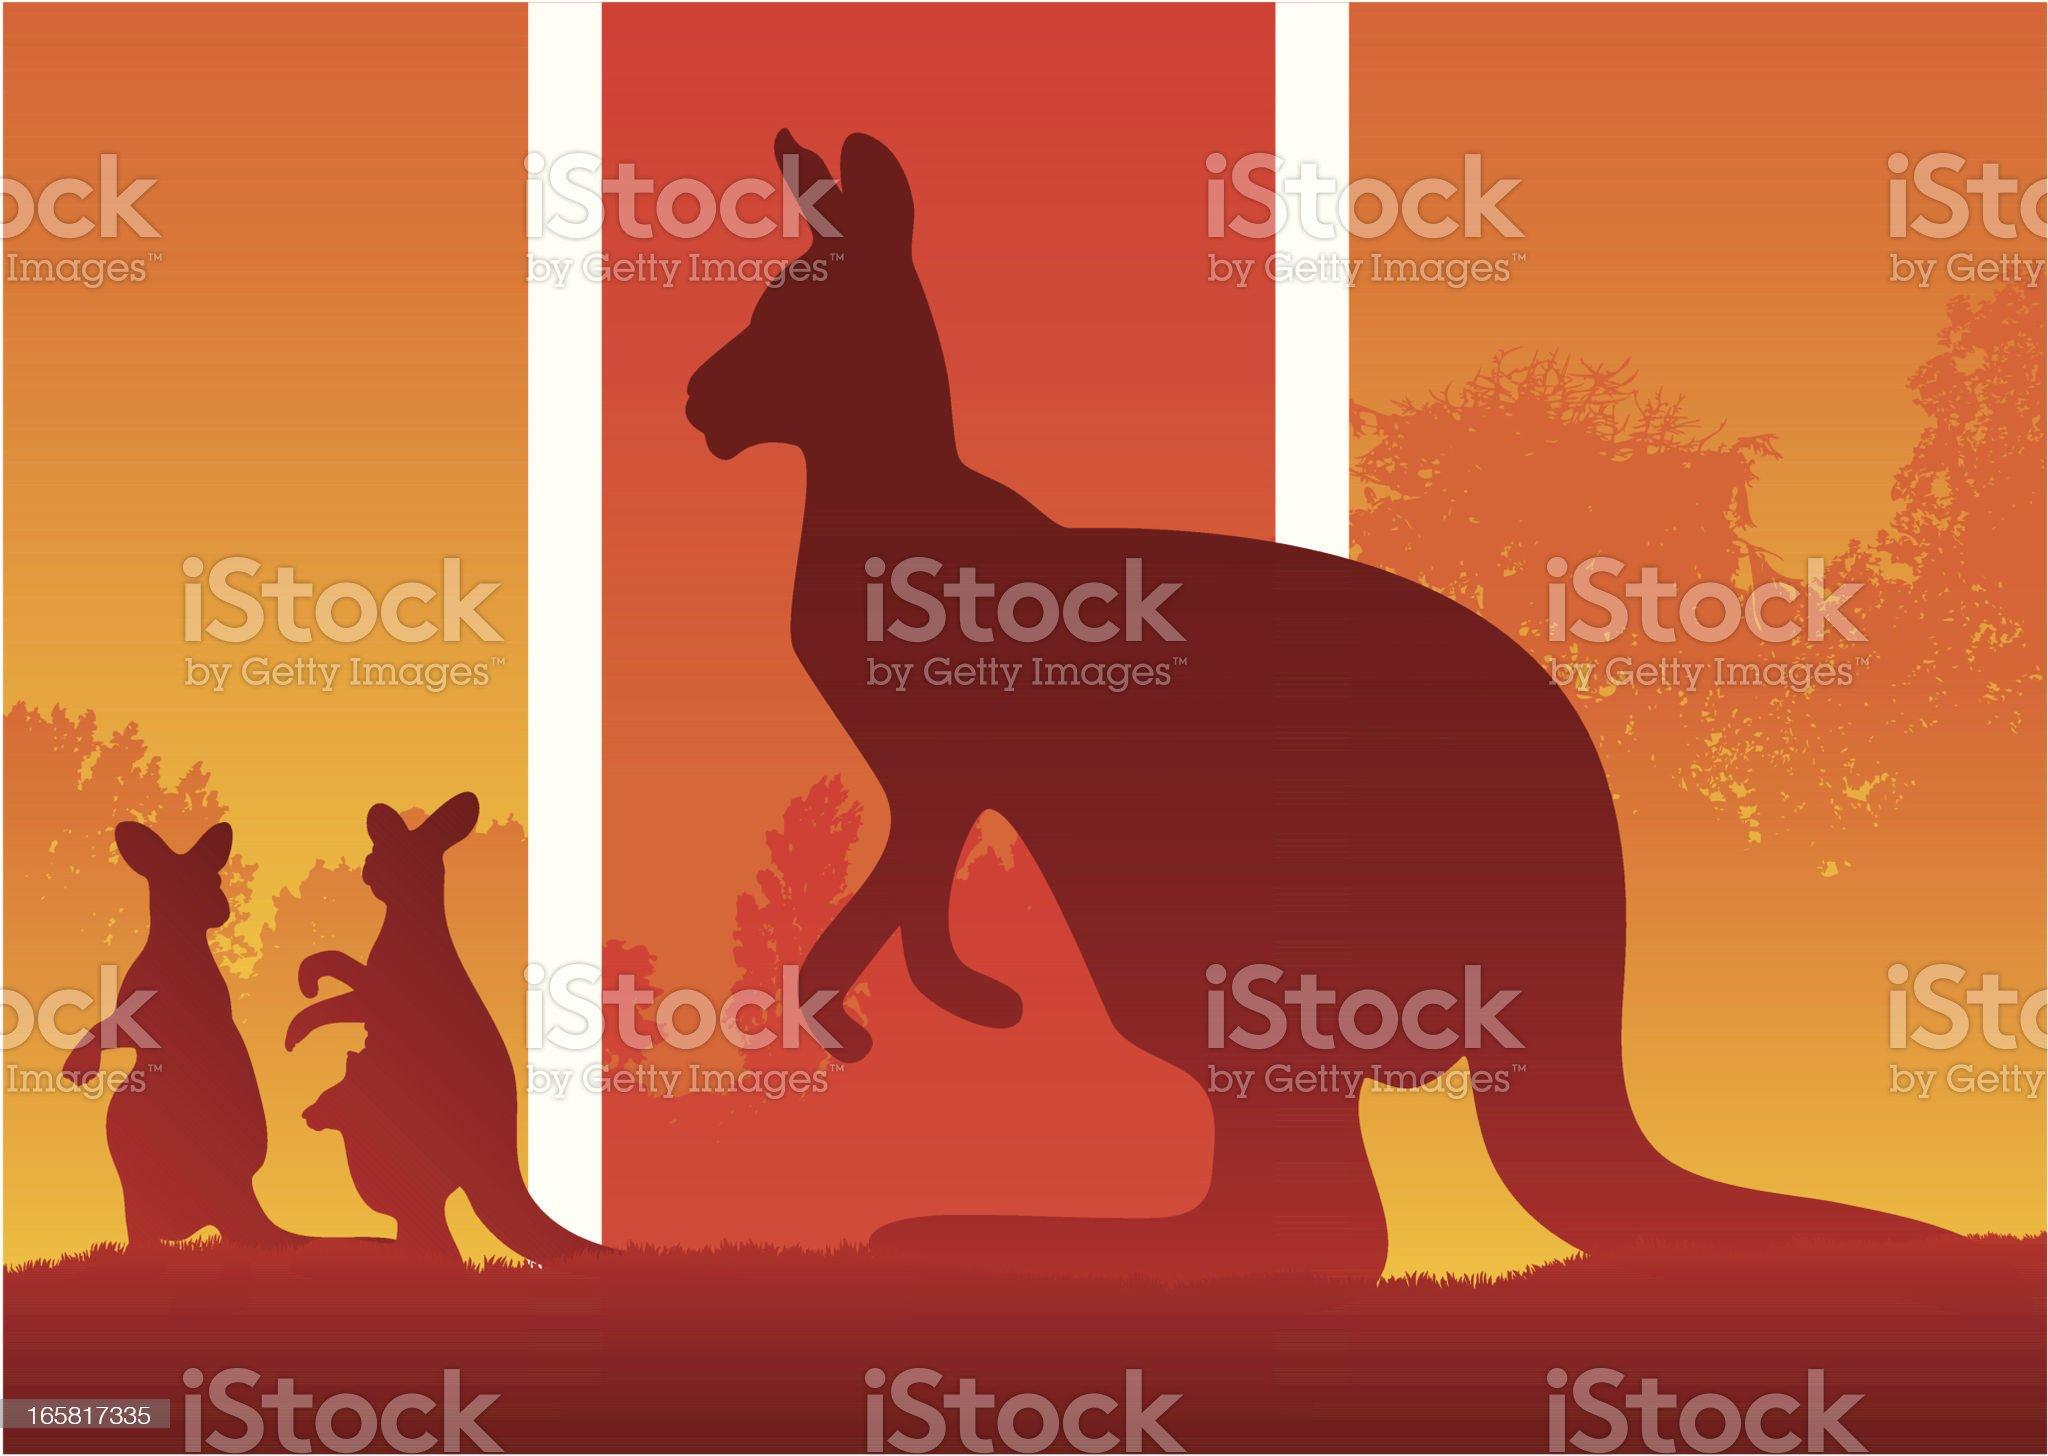 Silhouette of Kangaroos in the australian wild bush royalty-free stock vector art